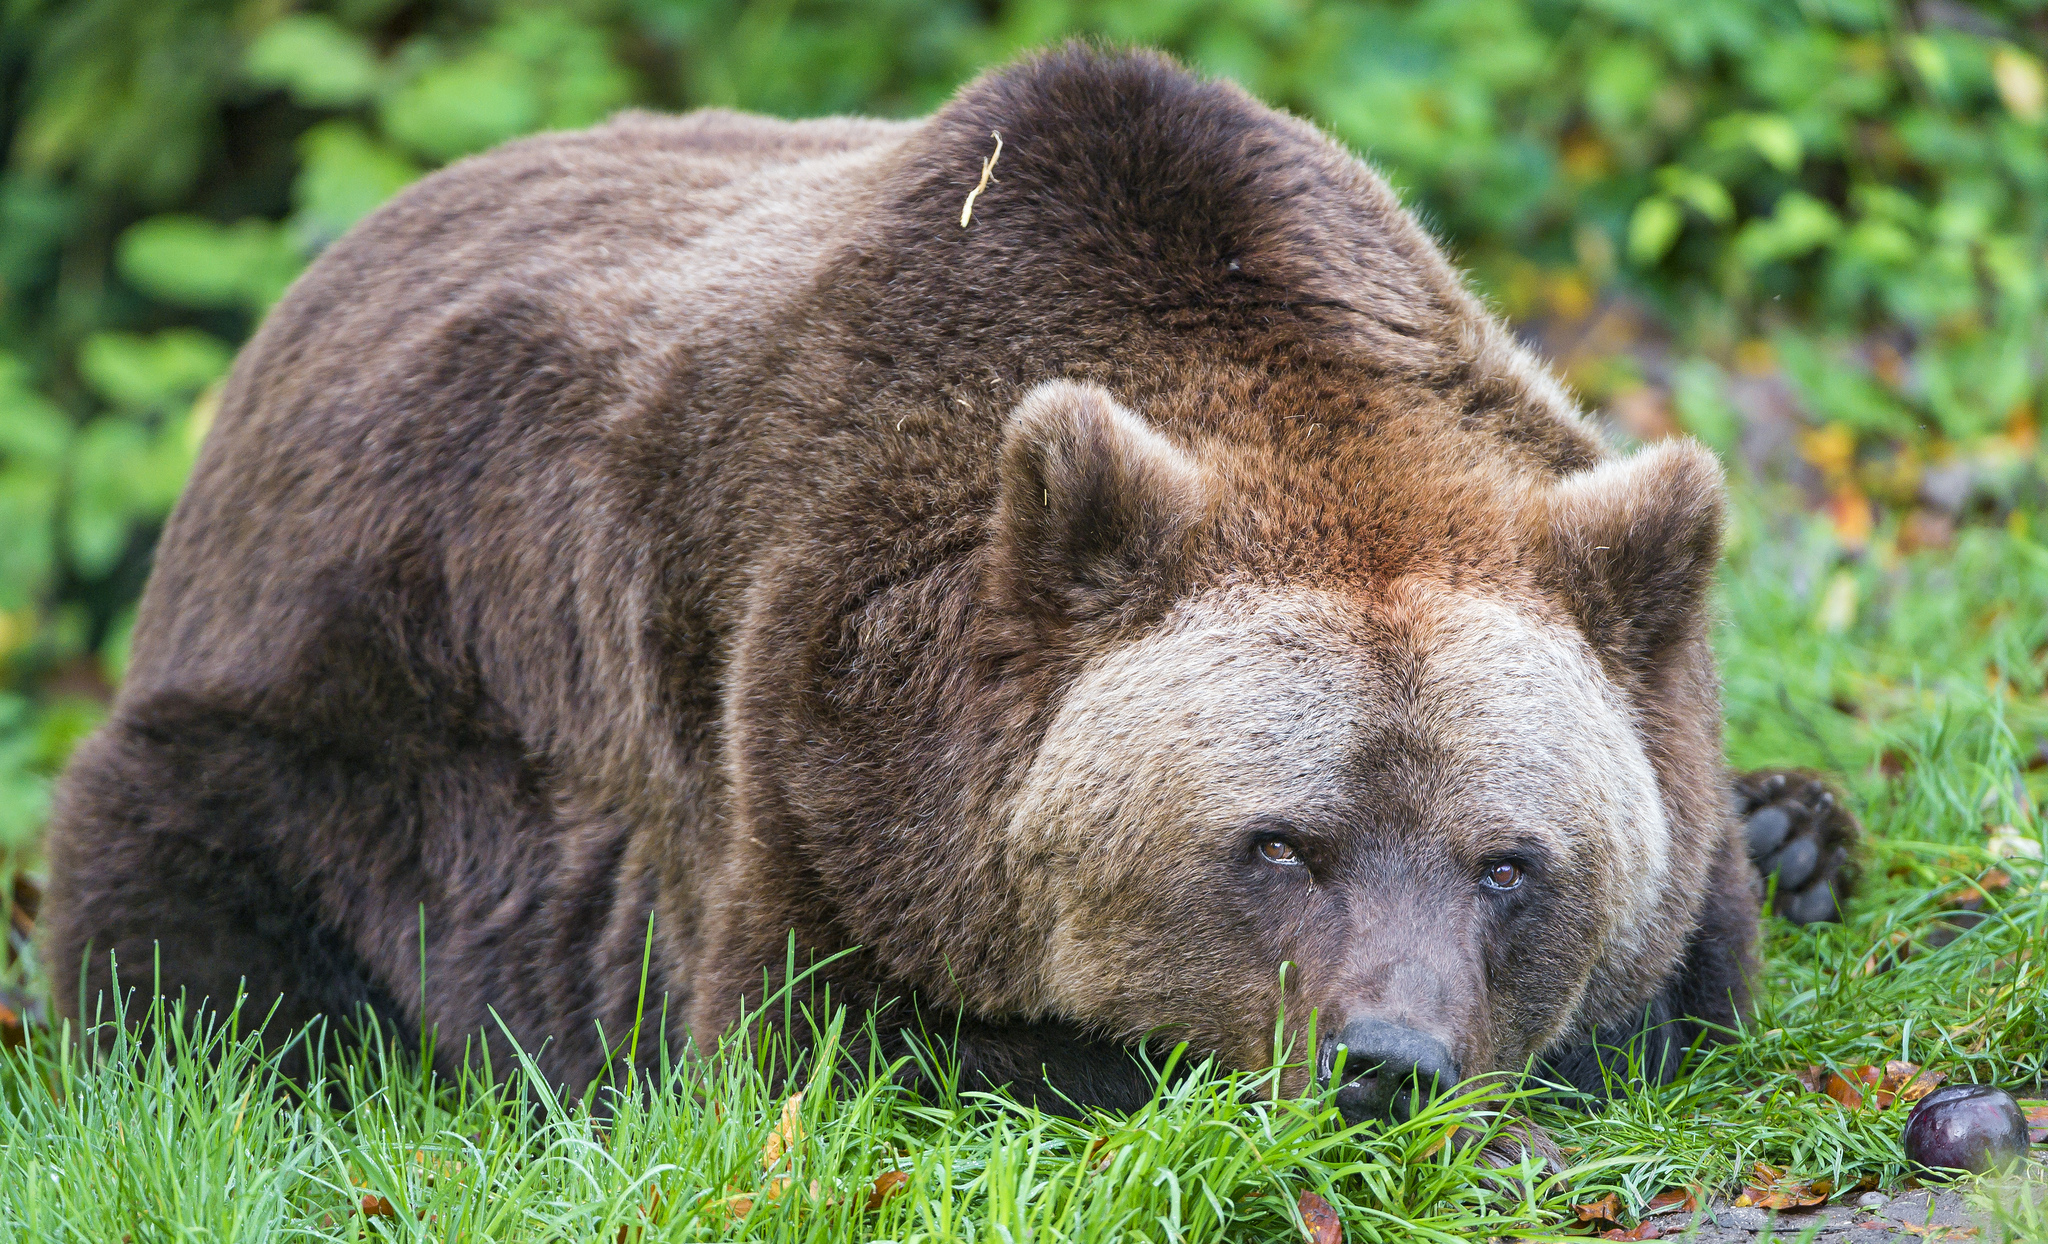 Зоопарк в Мюнхене, медведь